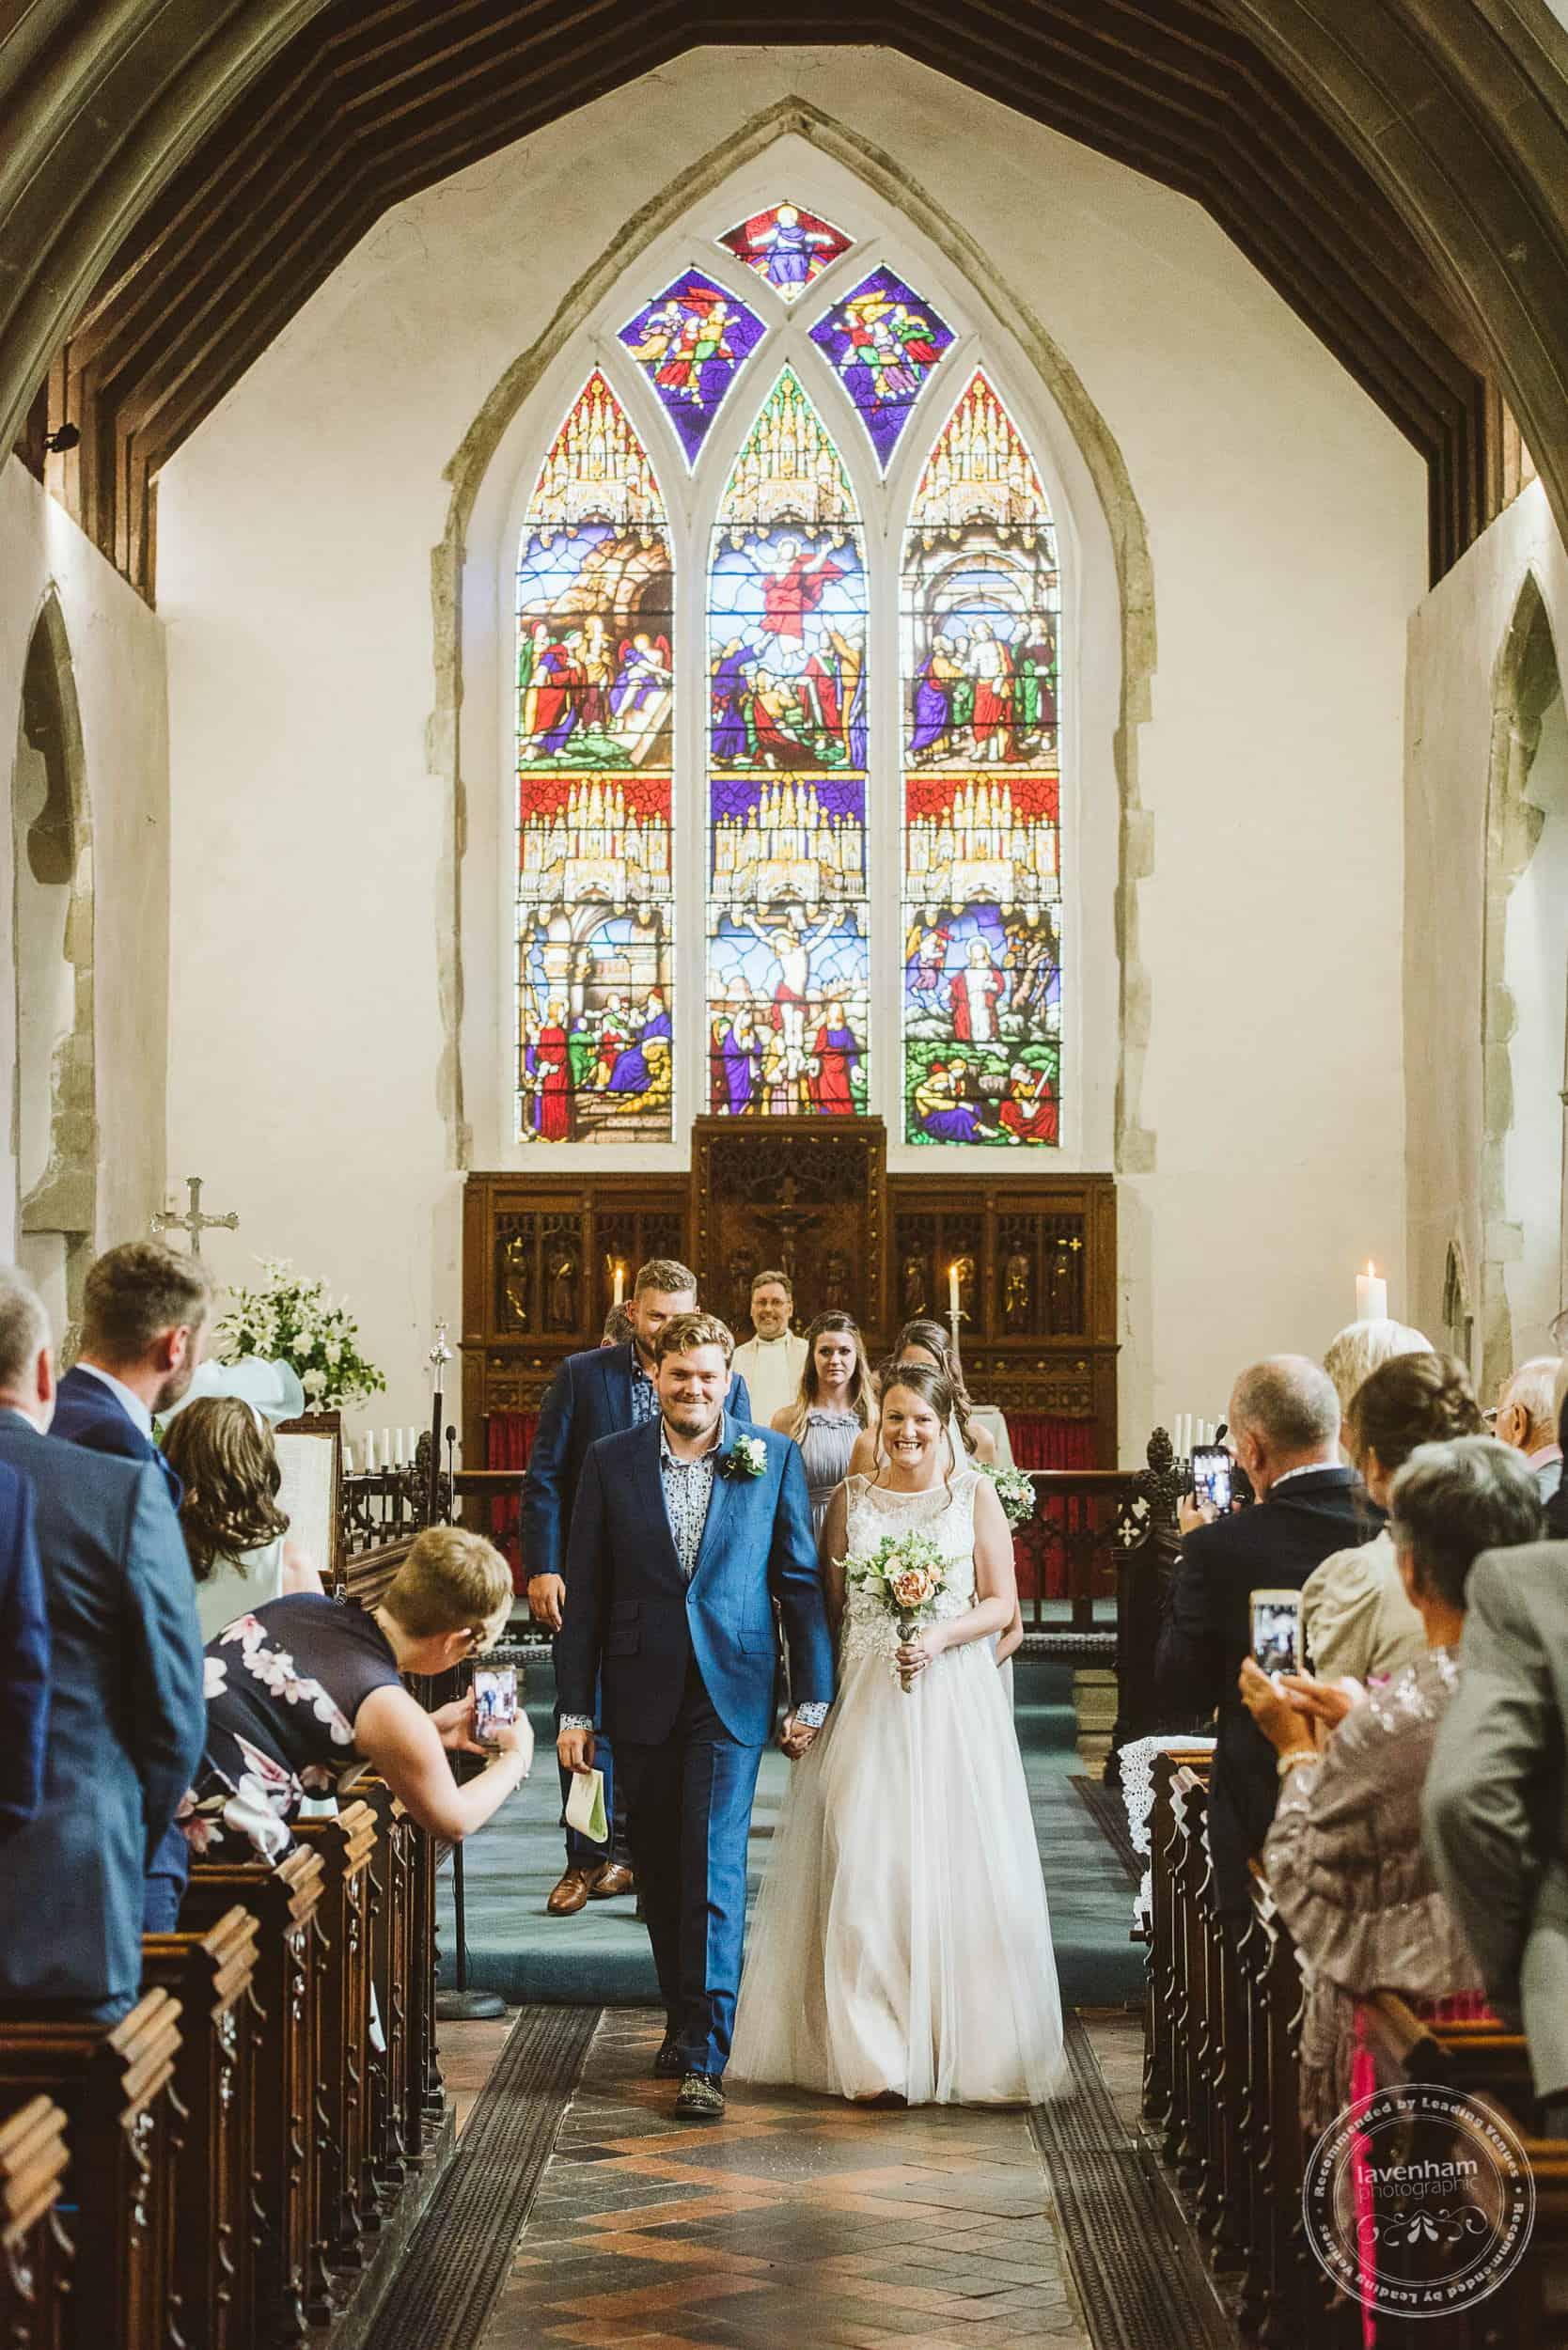 180818 Marks Hall Wedding Photography Lavenham Photographic 065